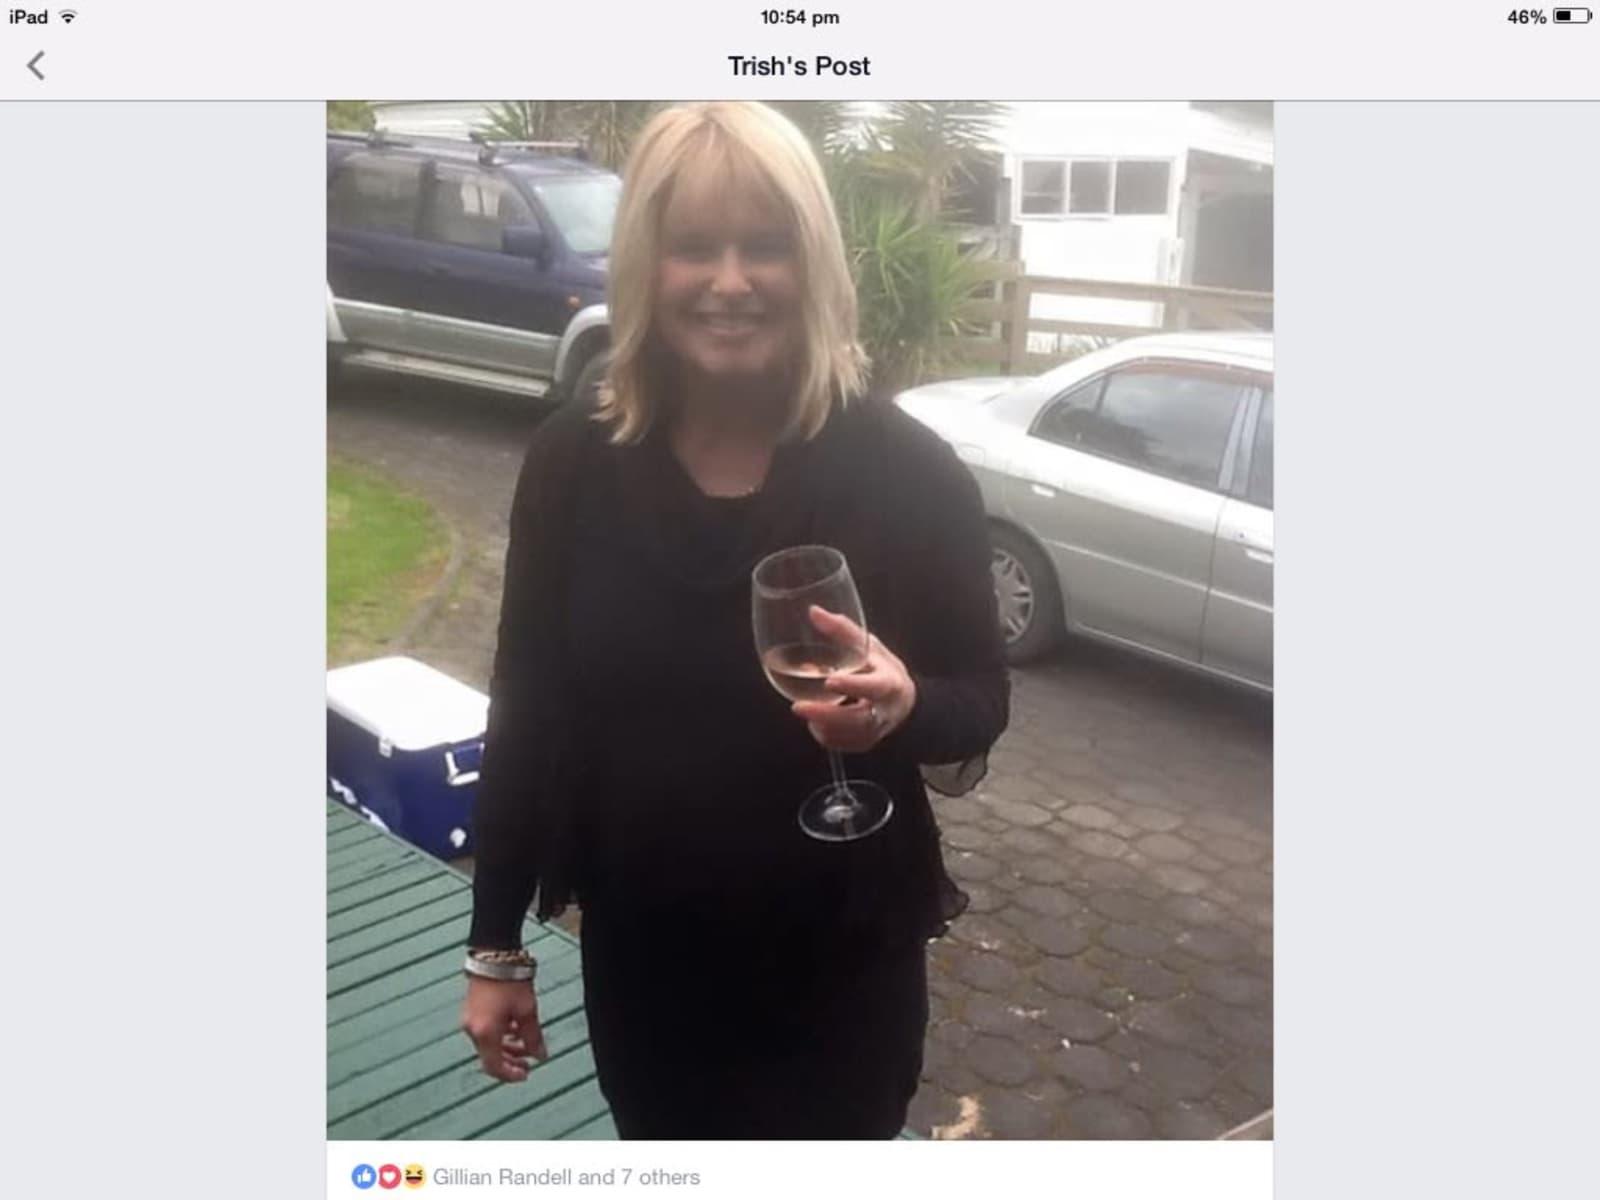 Trish from Torbay, New Zealand